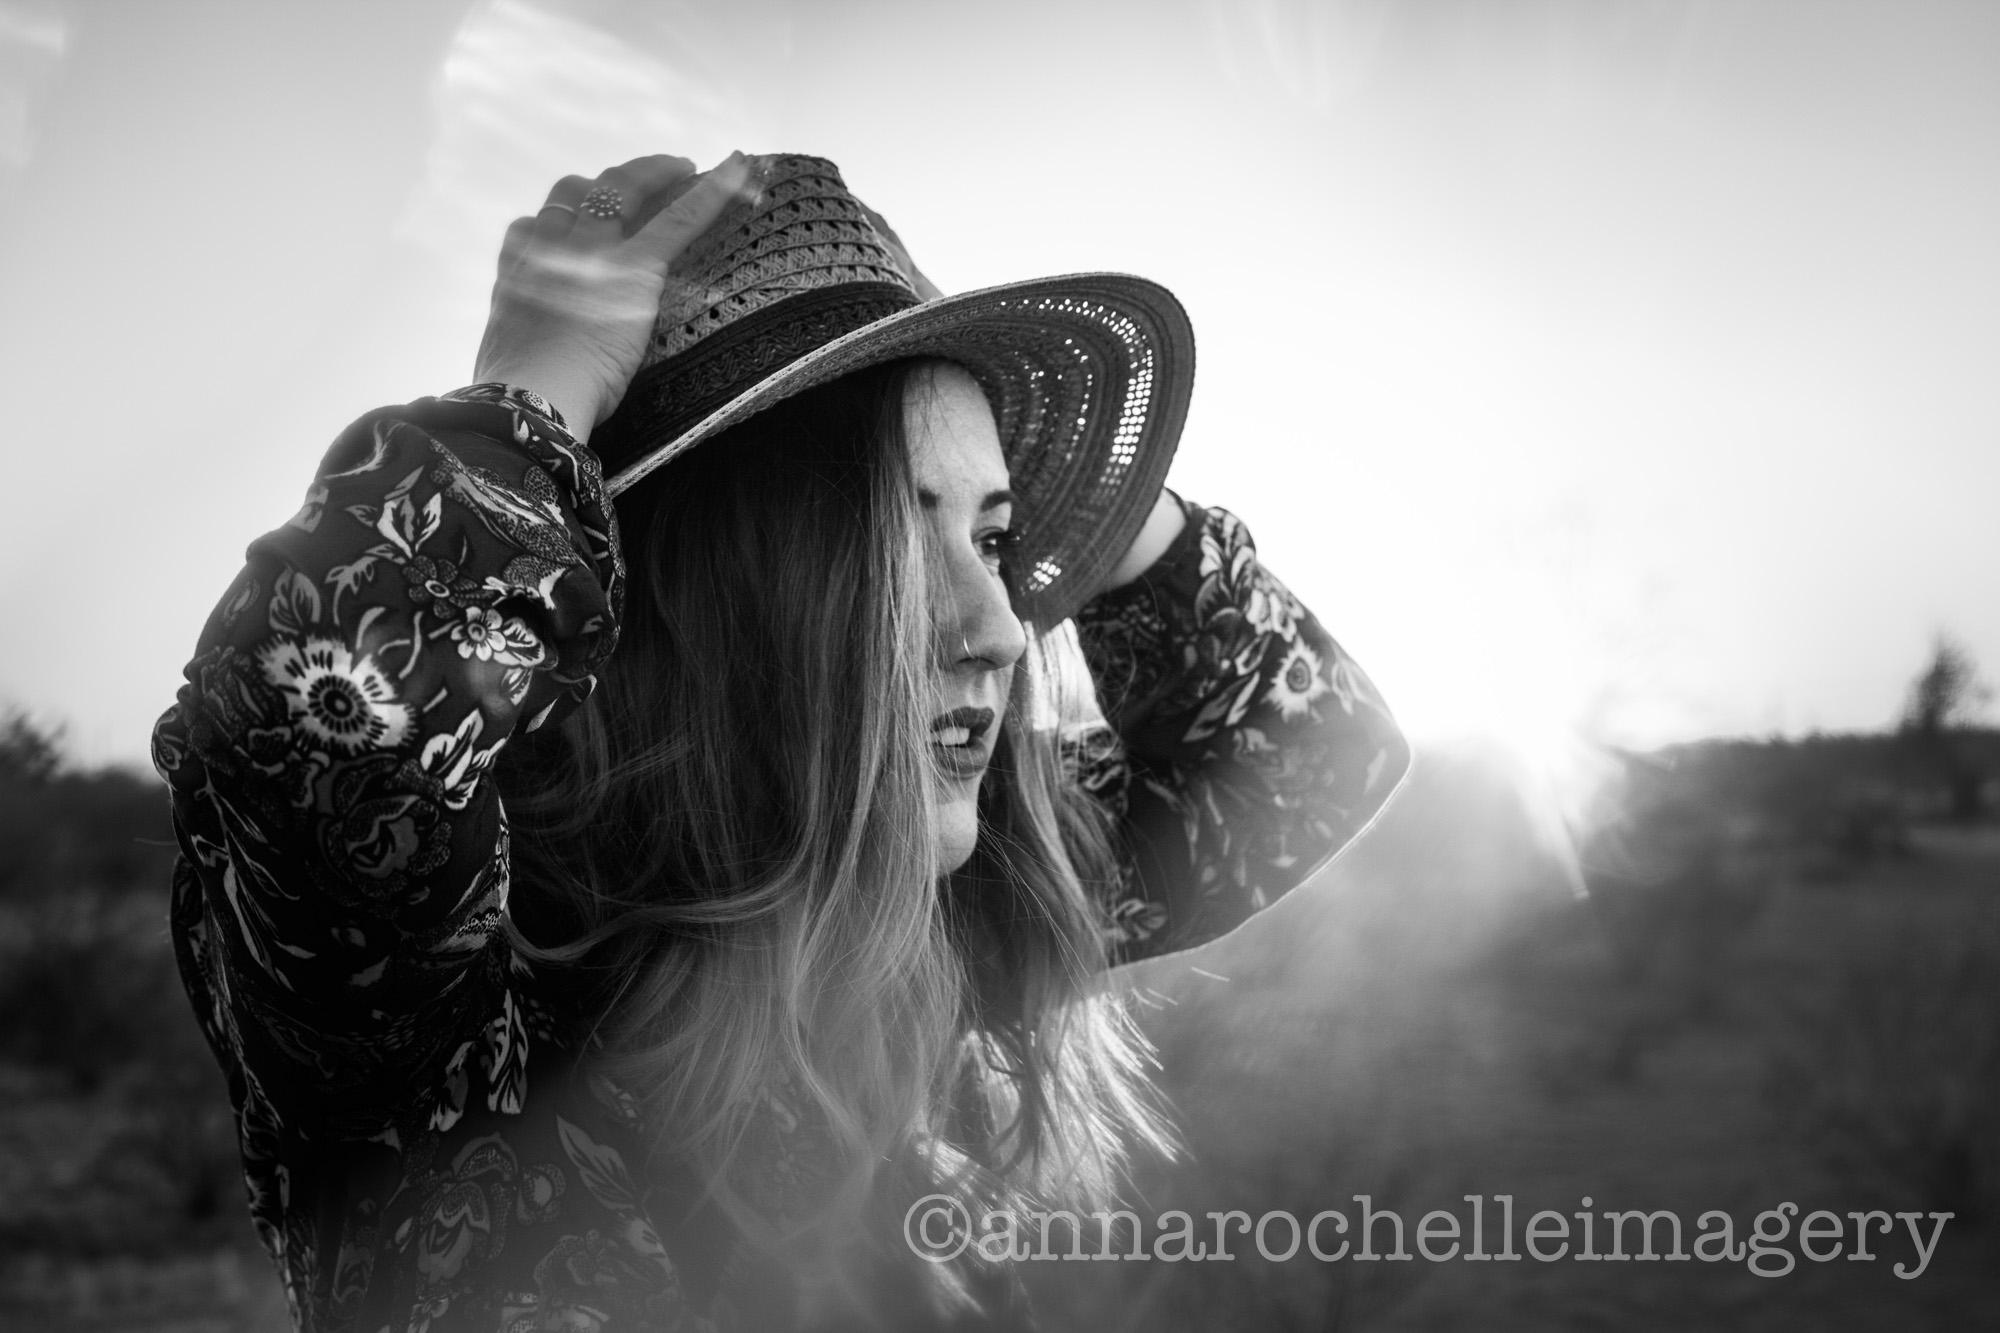 anna rochelle - blog-prism-creative-images-phoenix photographer.jpg